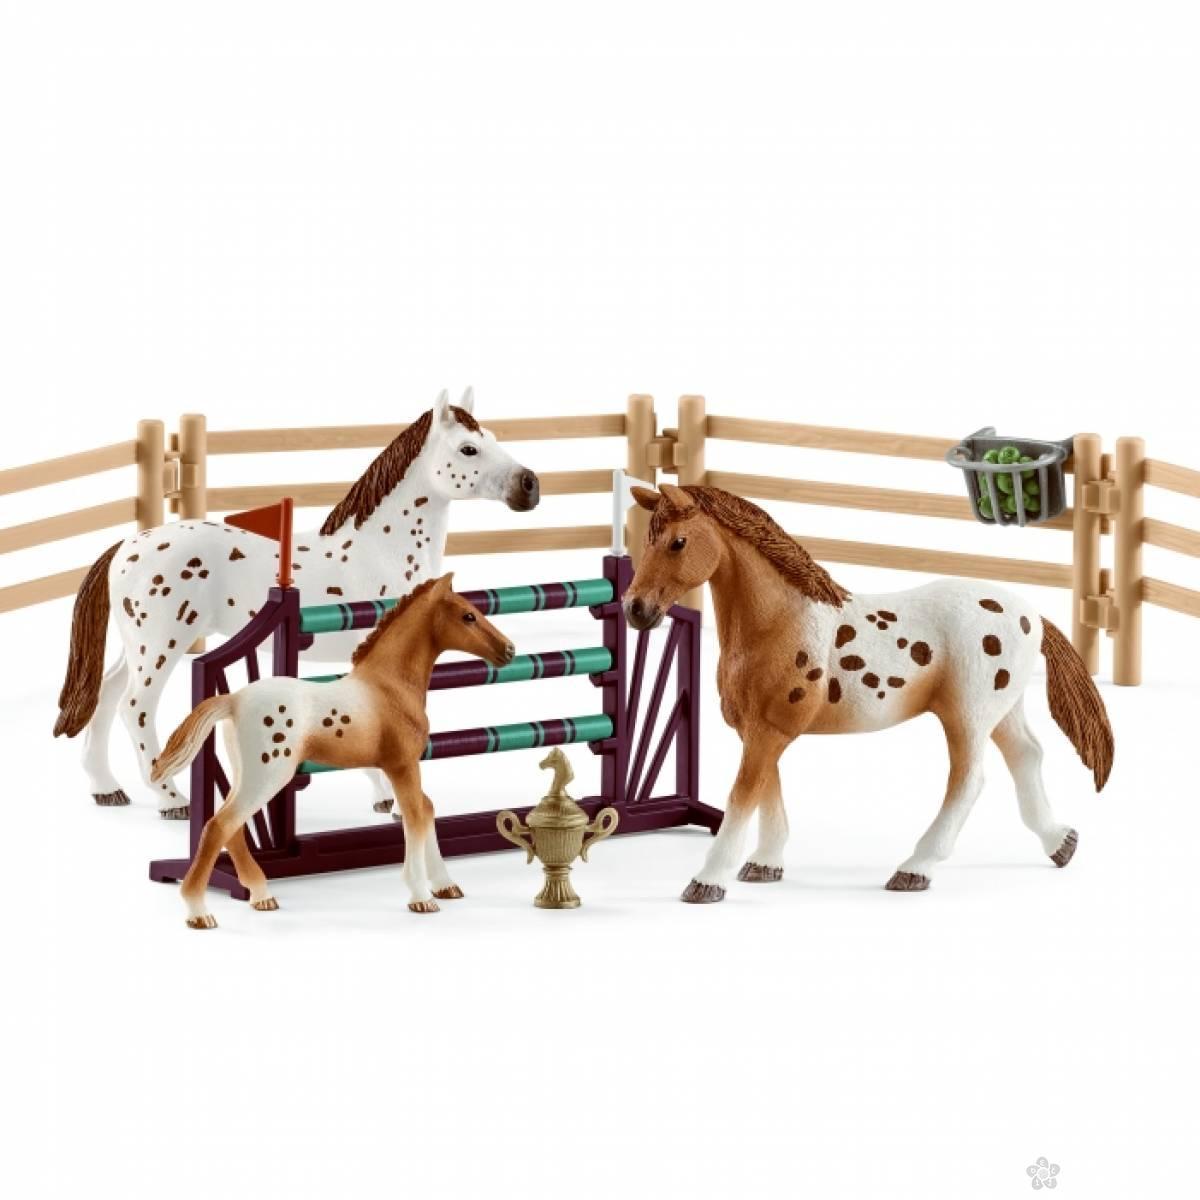 Turnirski trening konja